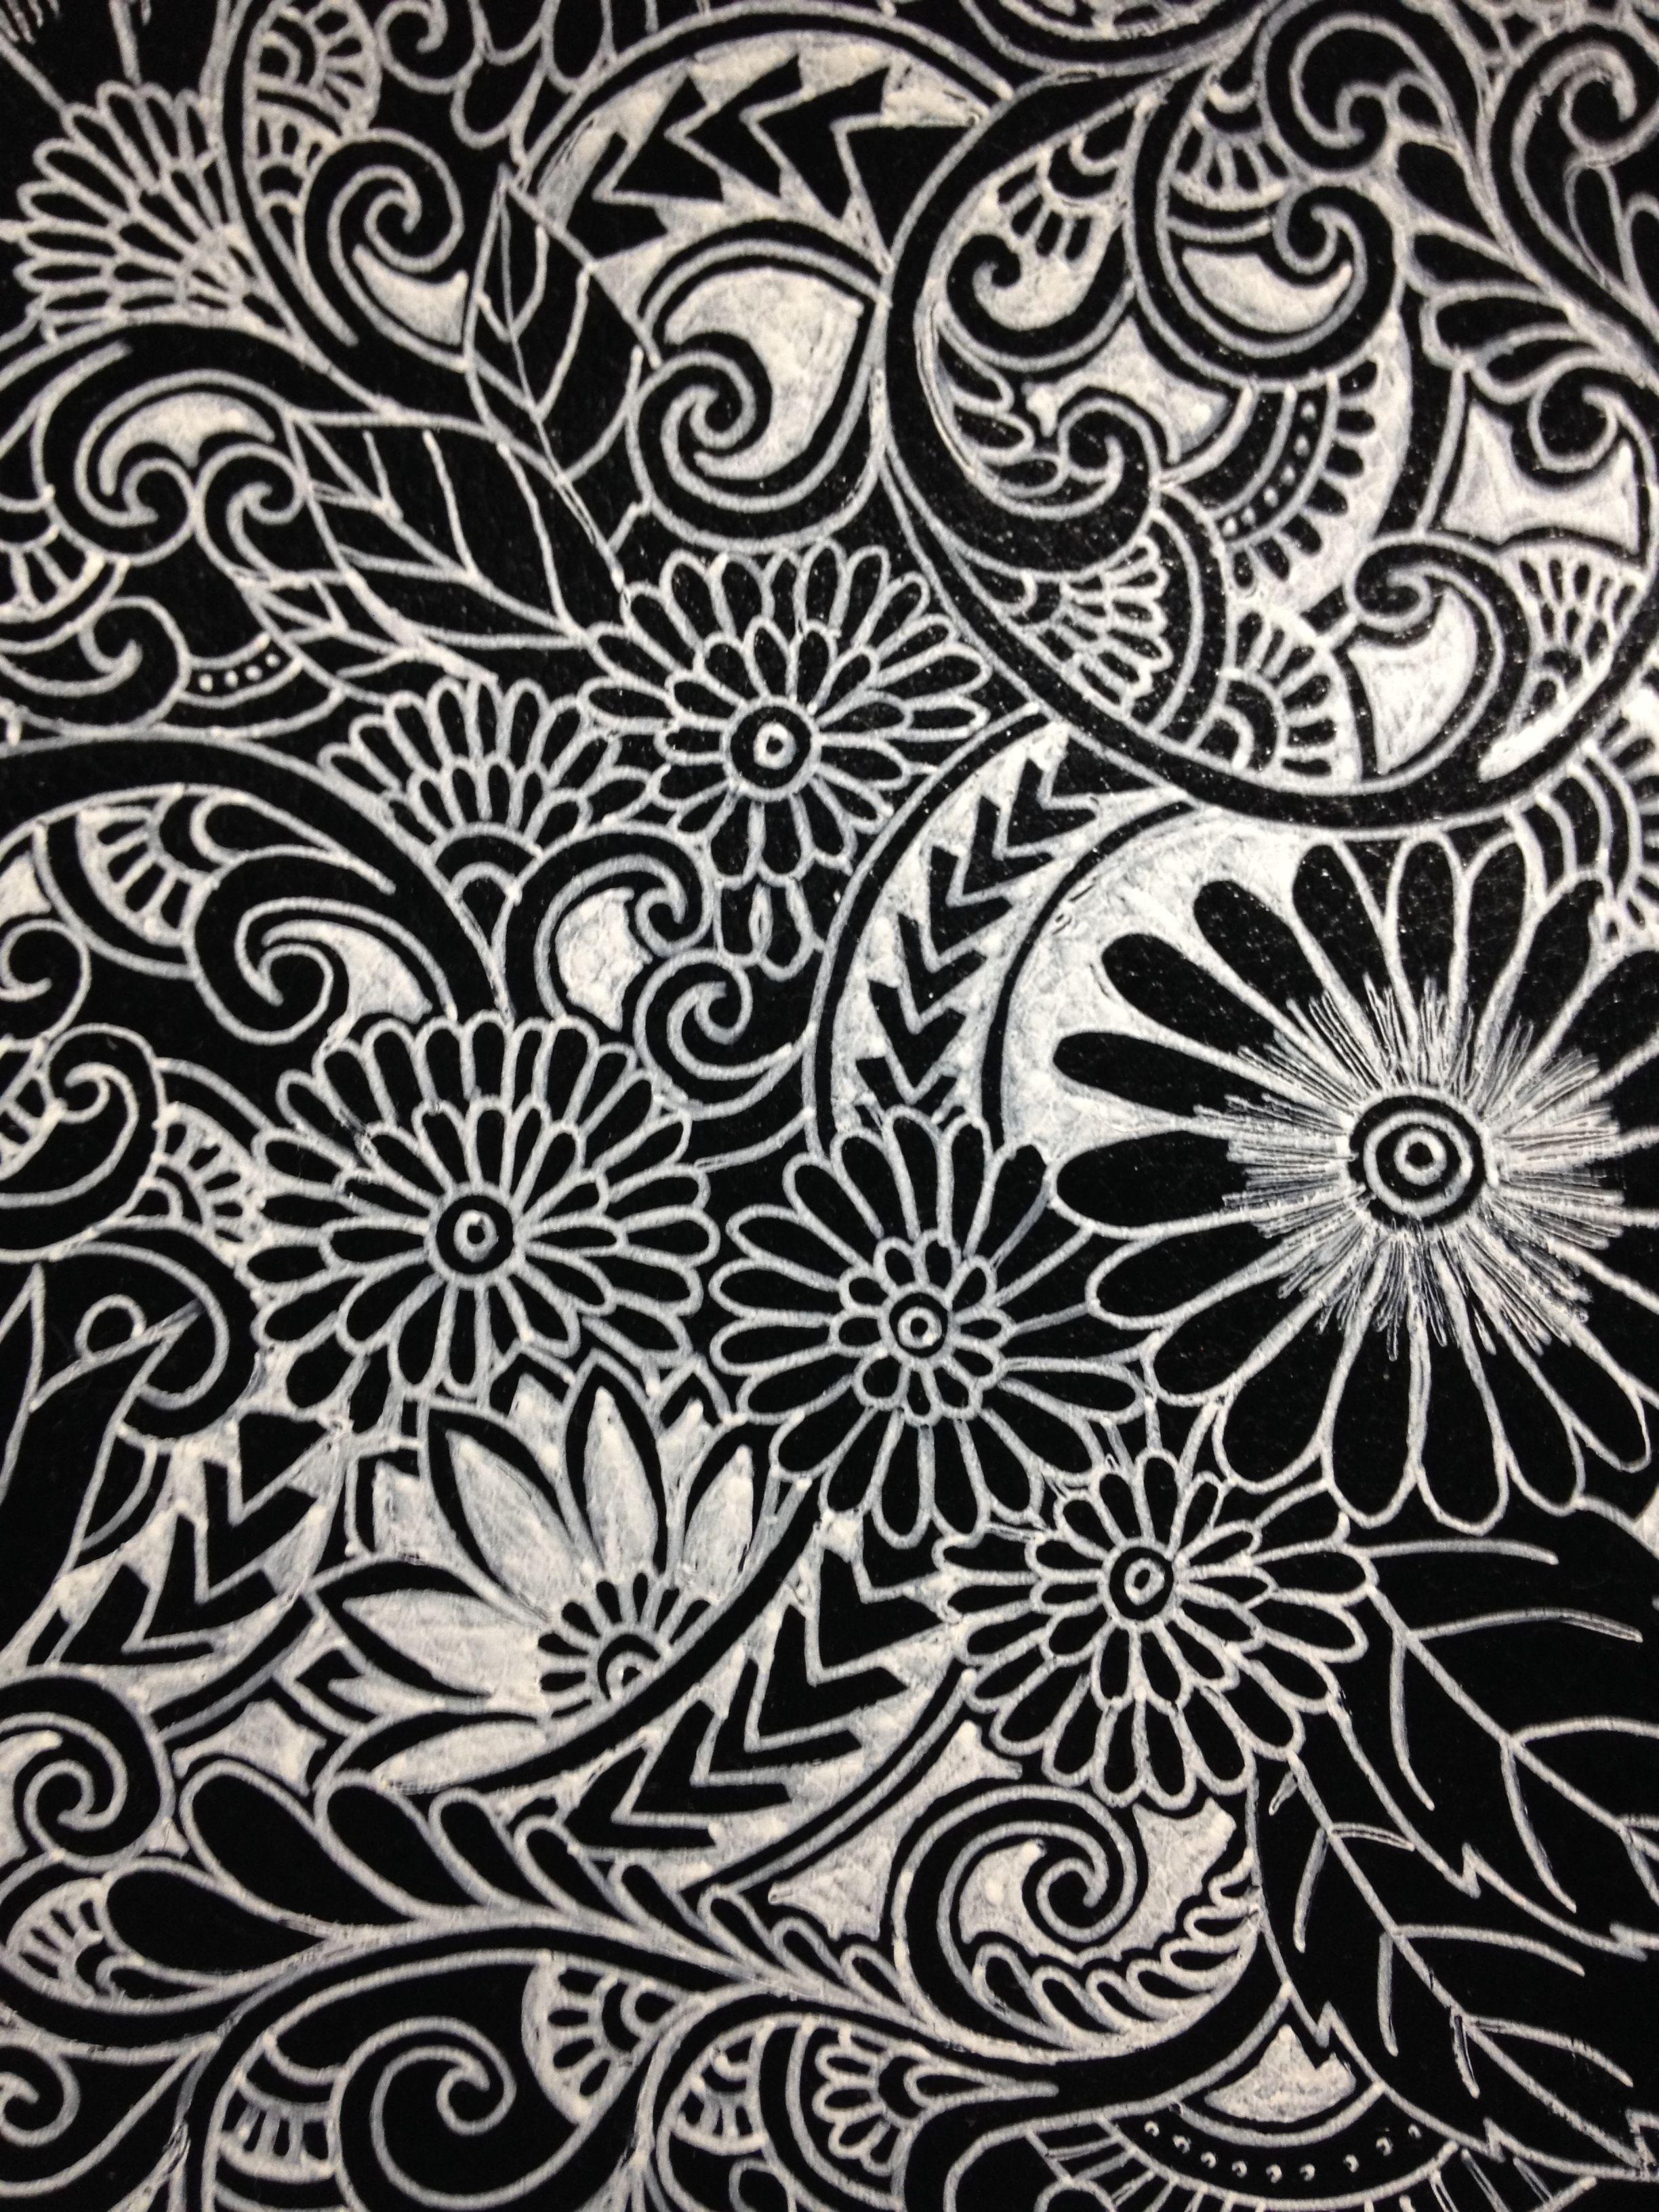 Botanical & tribal drawings  Noah's ART - https://www.facebook.com/pages/Noahs-ART/154658641235702